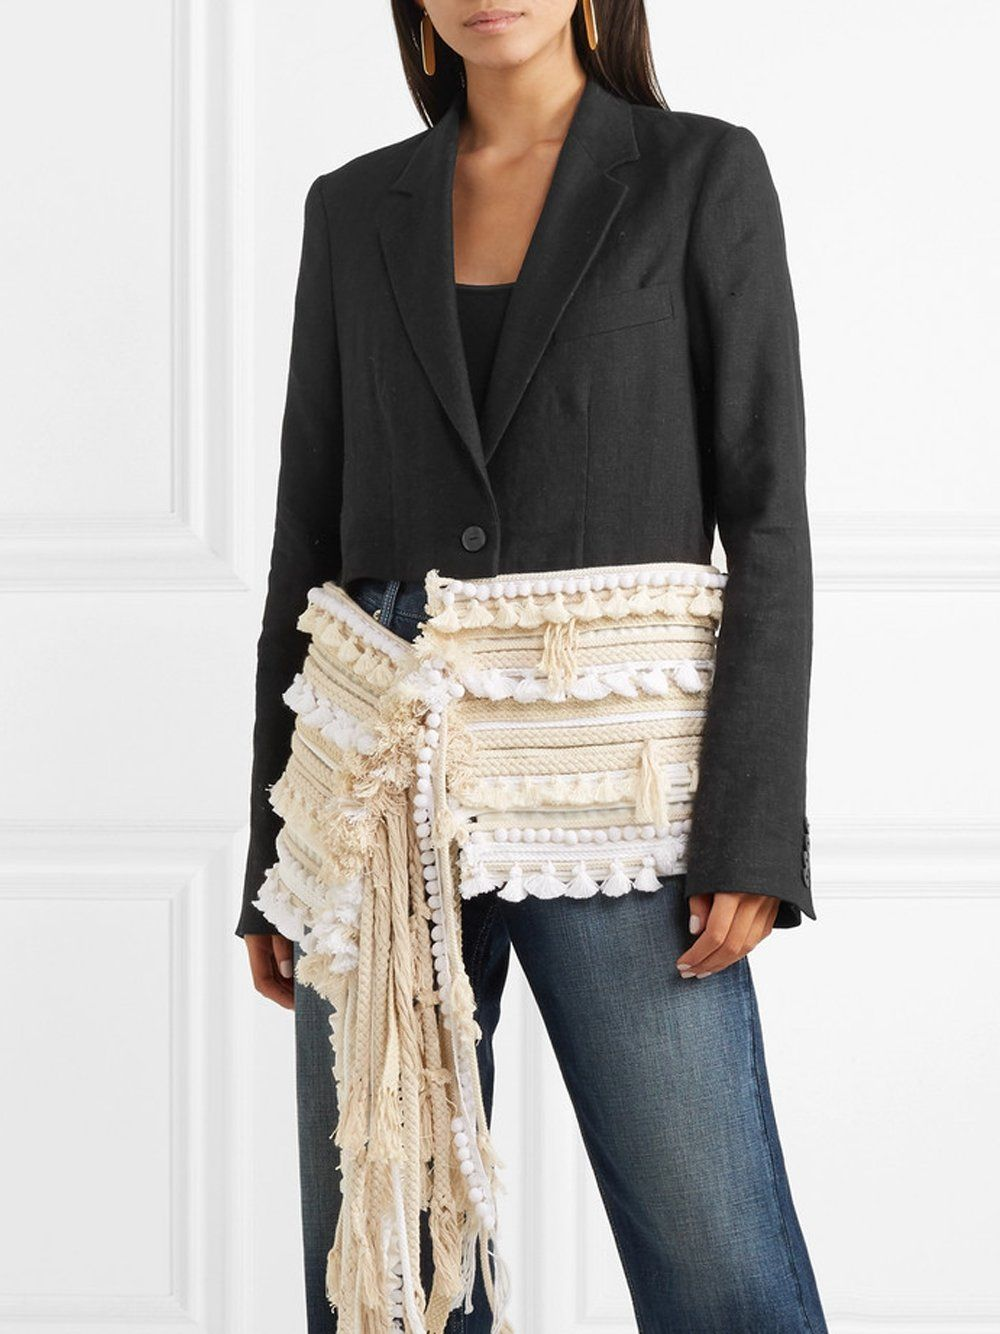 ANAELE Ropetrimmed linen Blazer Linen blazer, Fashion